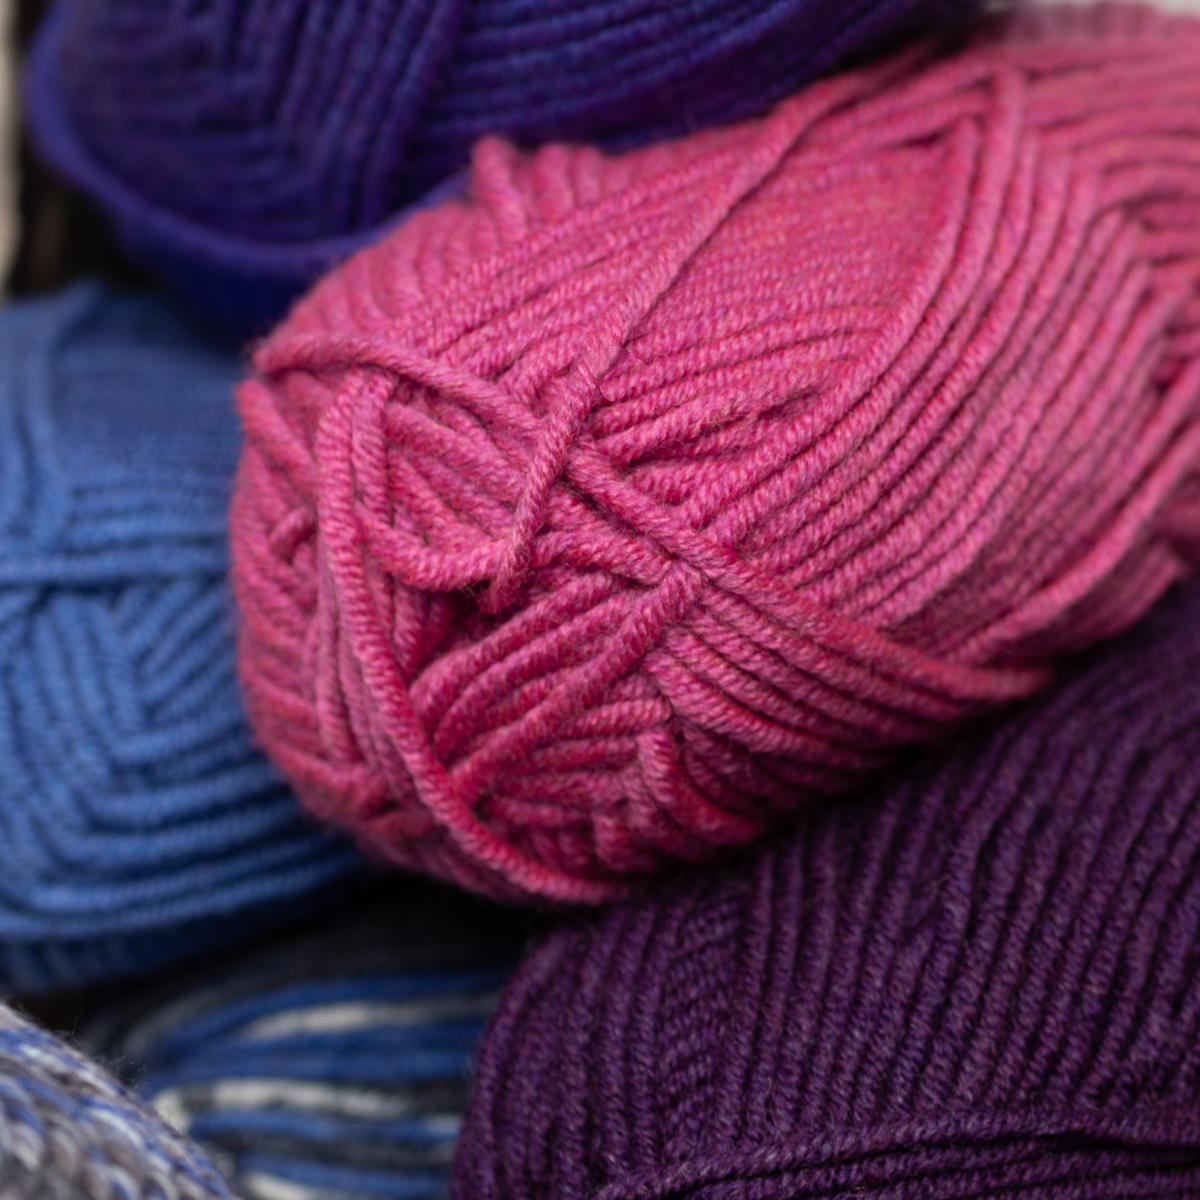 3pk-Lion-Brand-Woolspun-Acrylic-amp-Wool-Yarn-Bulky-5-Knit-Crocheting-Skeins-Soft thumbnail 50